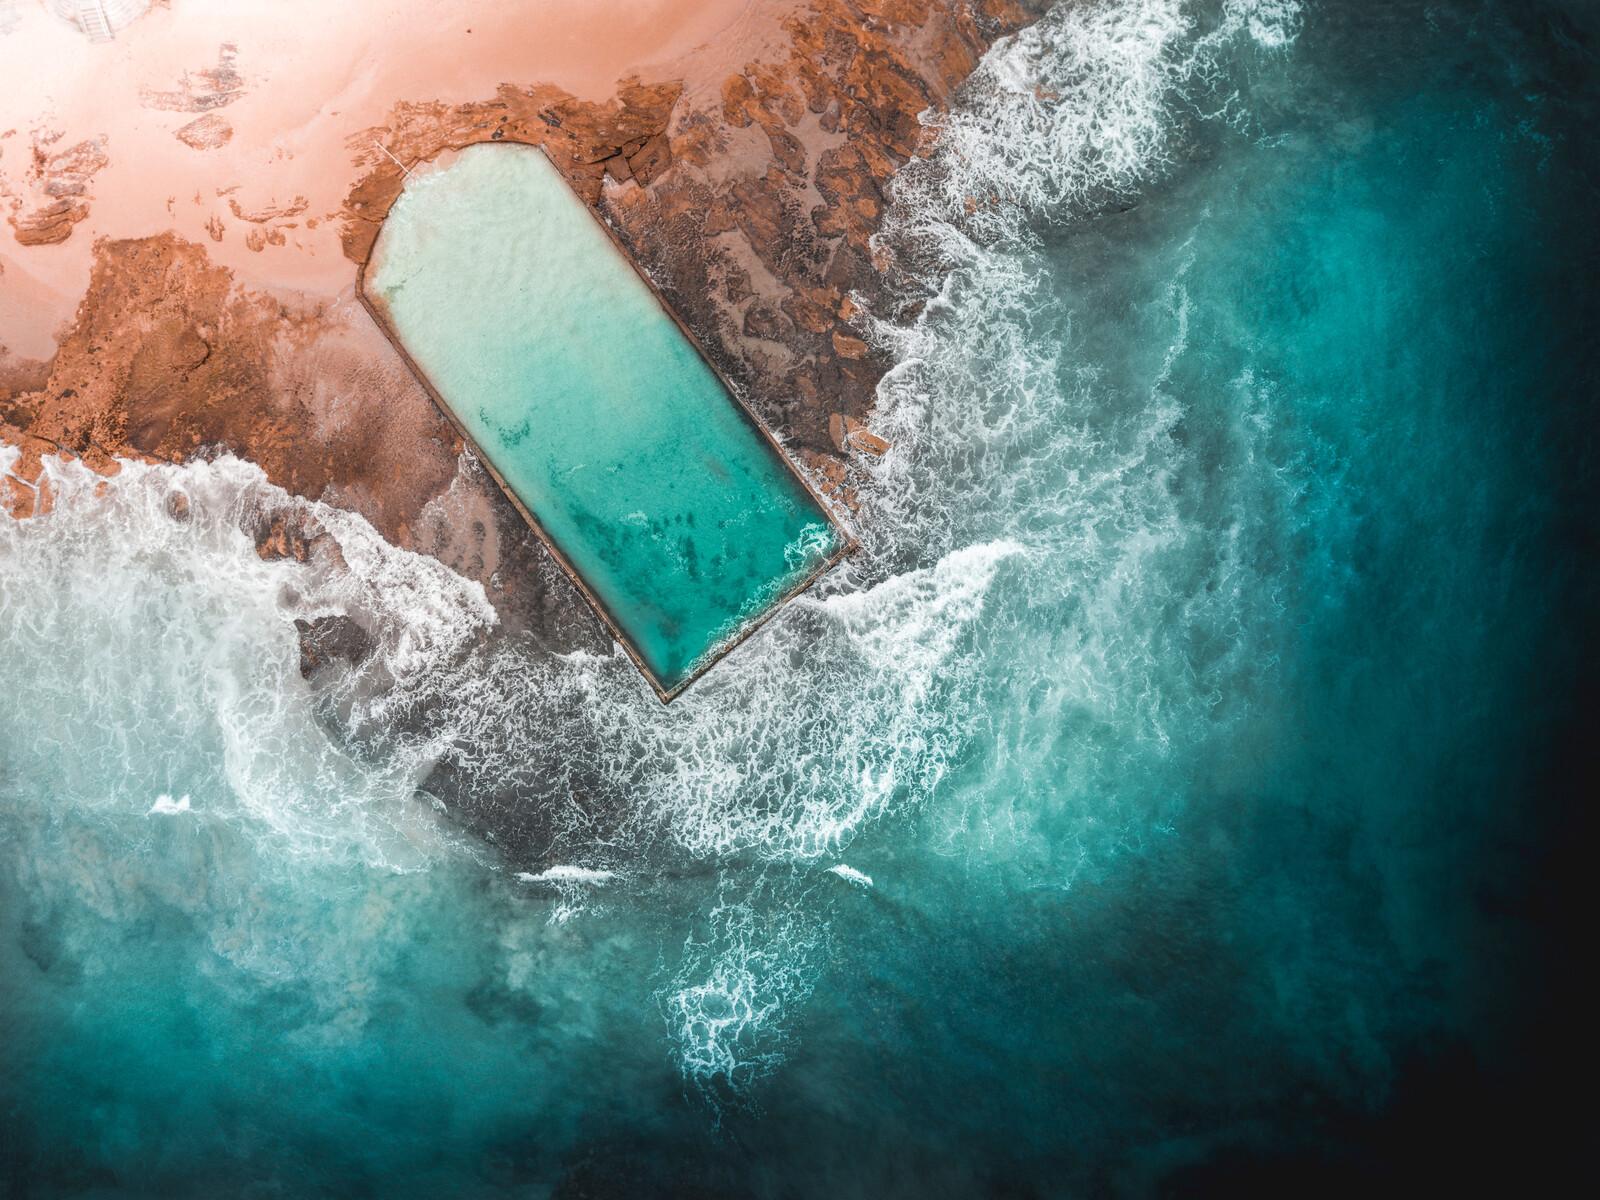 Cronulla Rock Pool 01 - Peter Yan